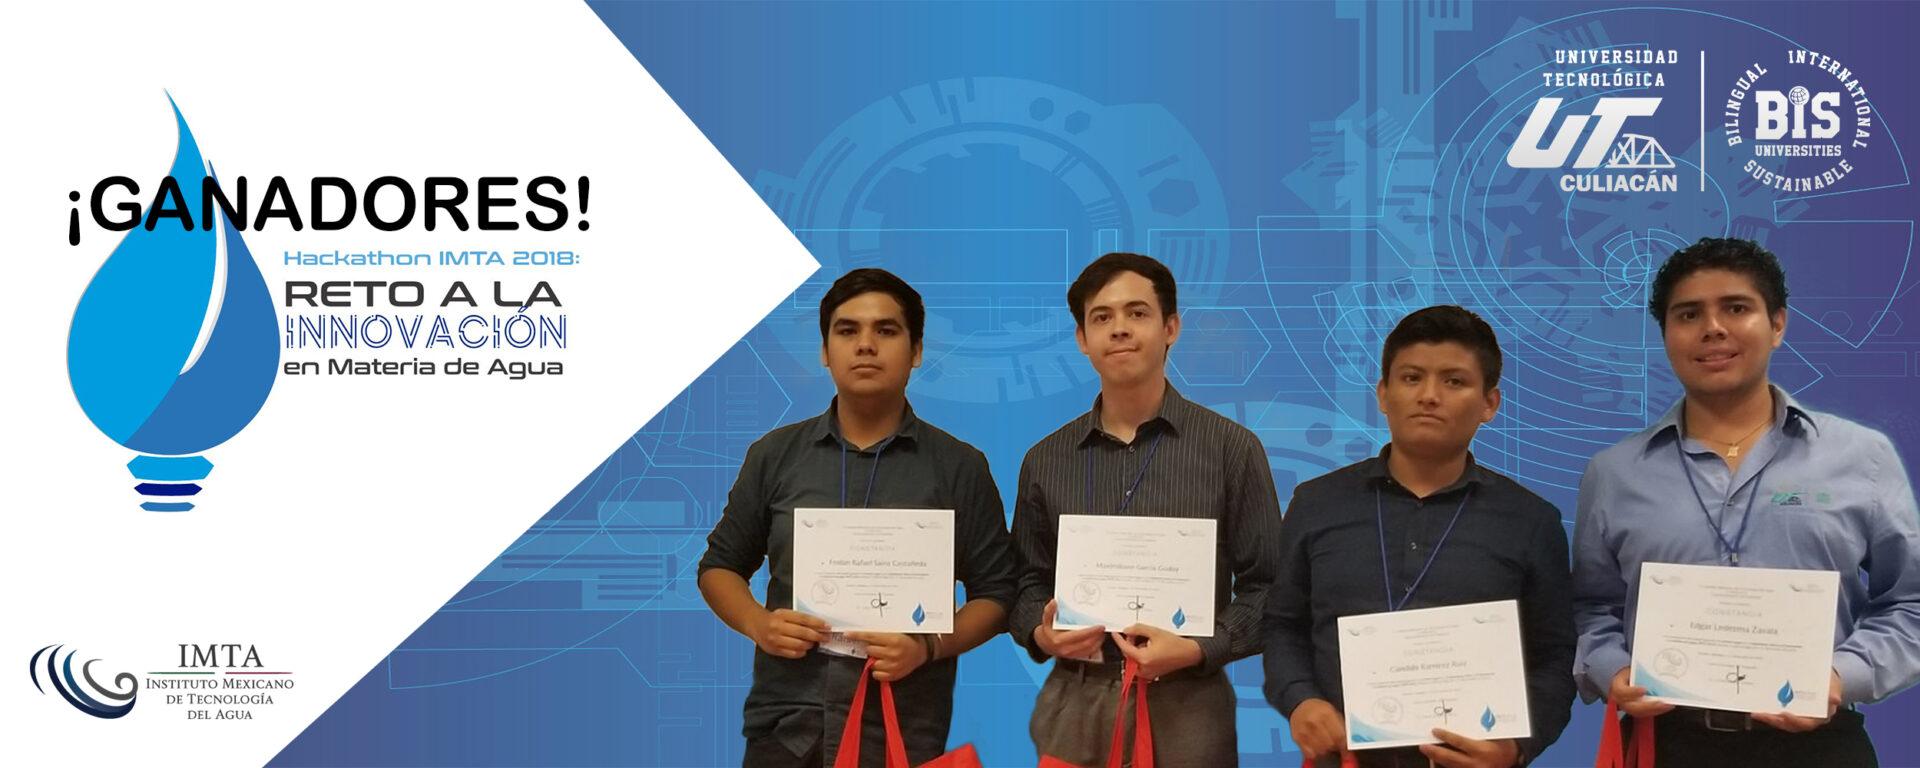 Hackathon IMTA 2018